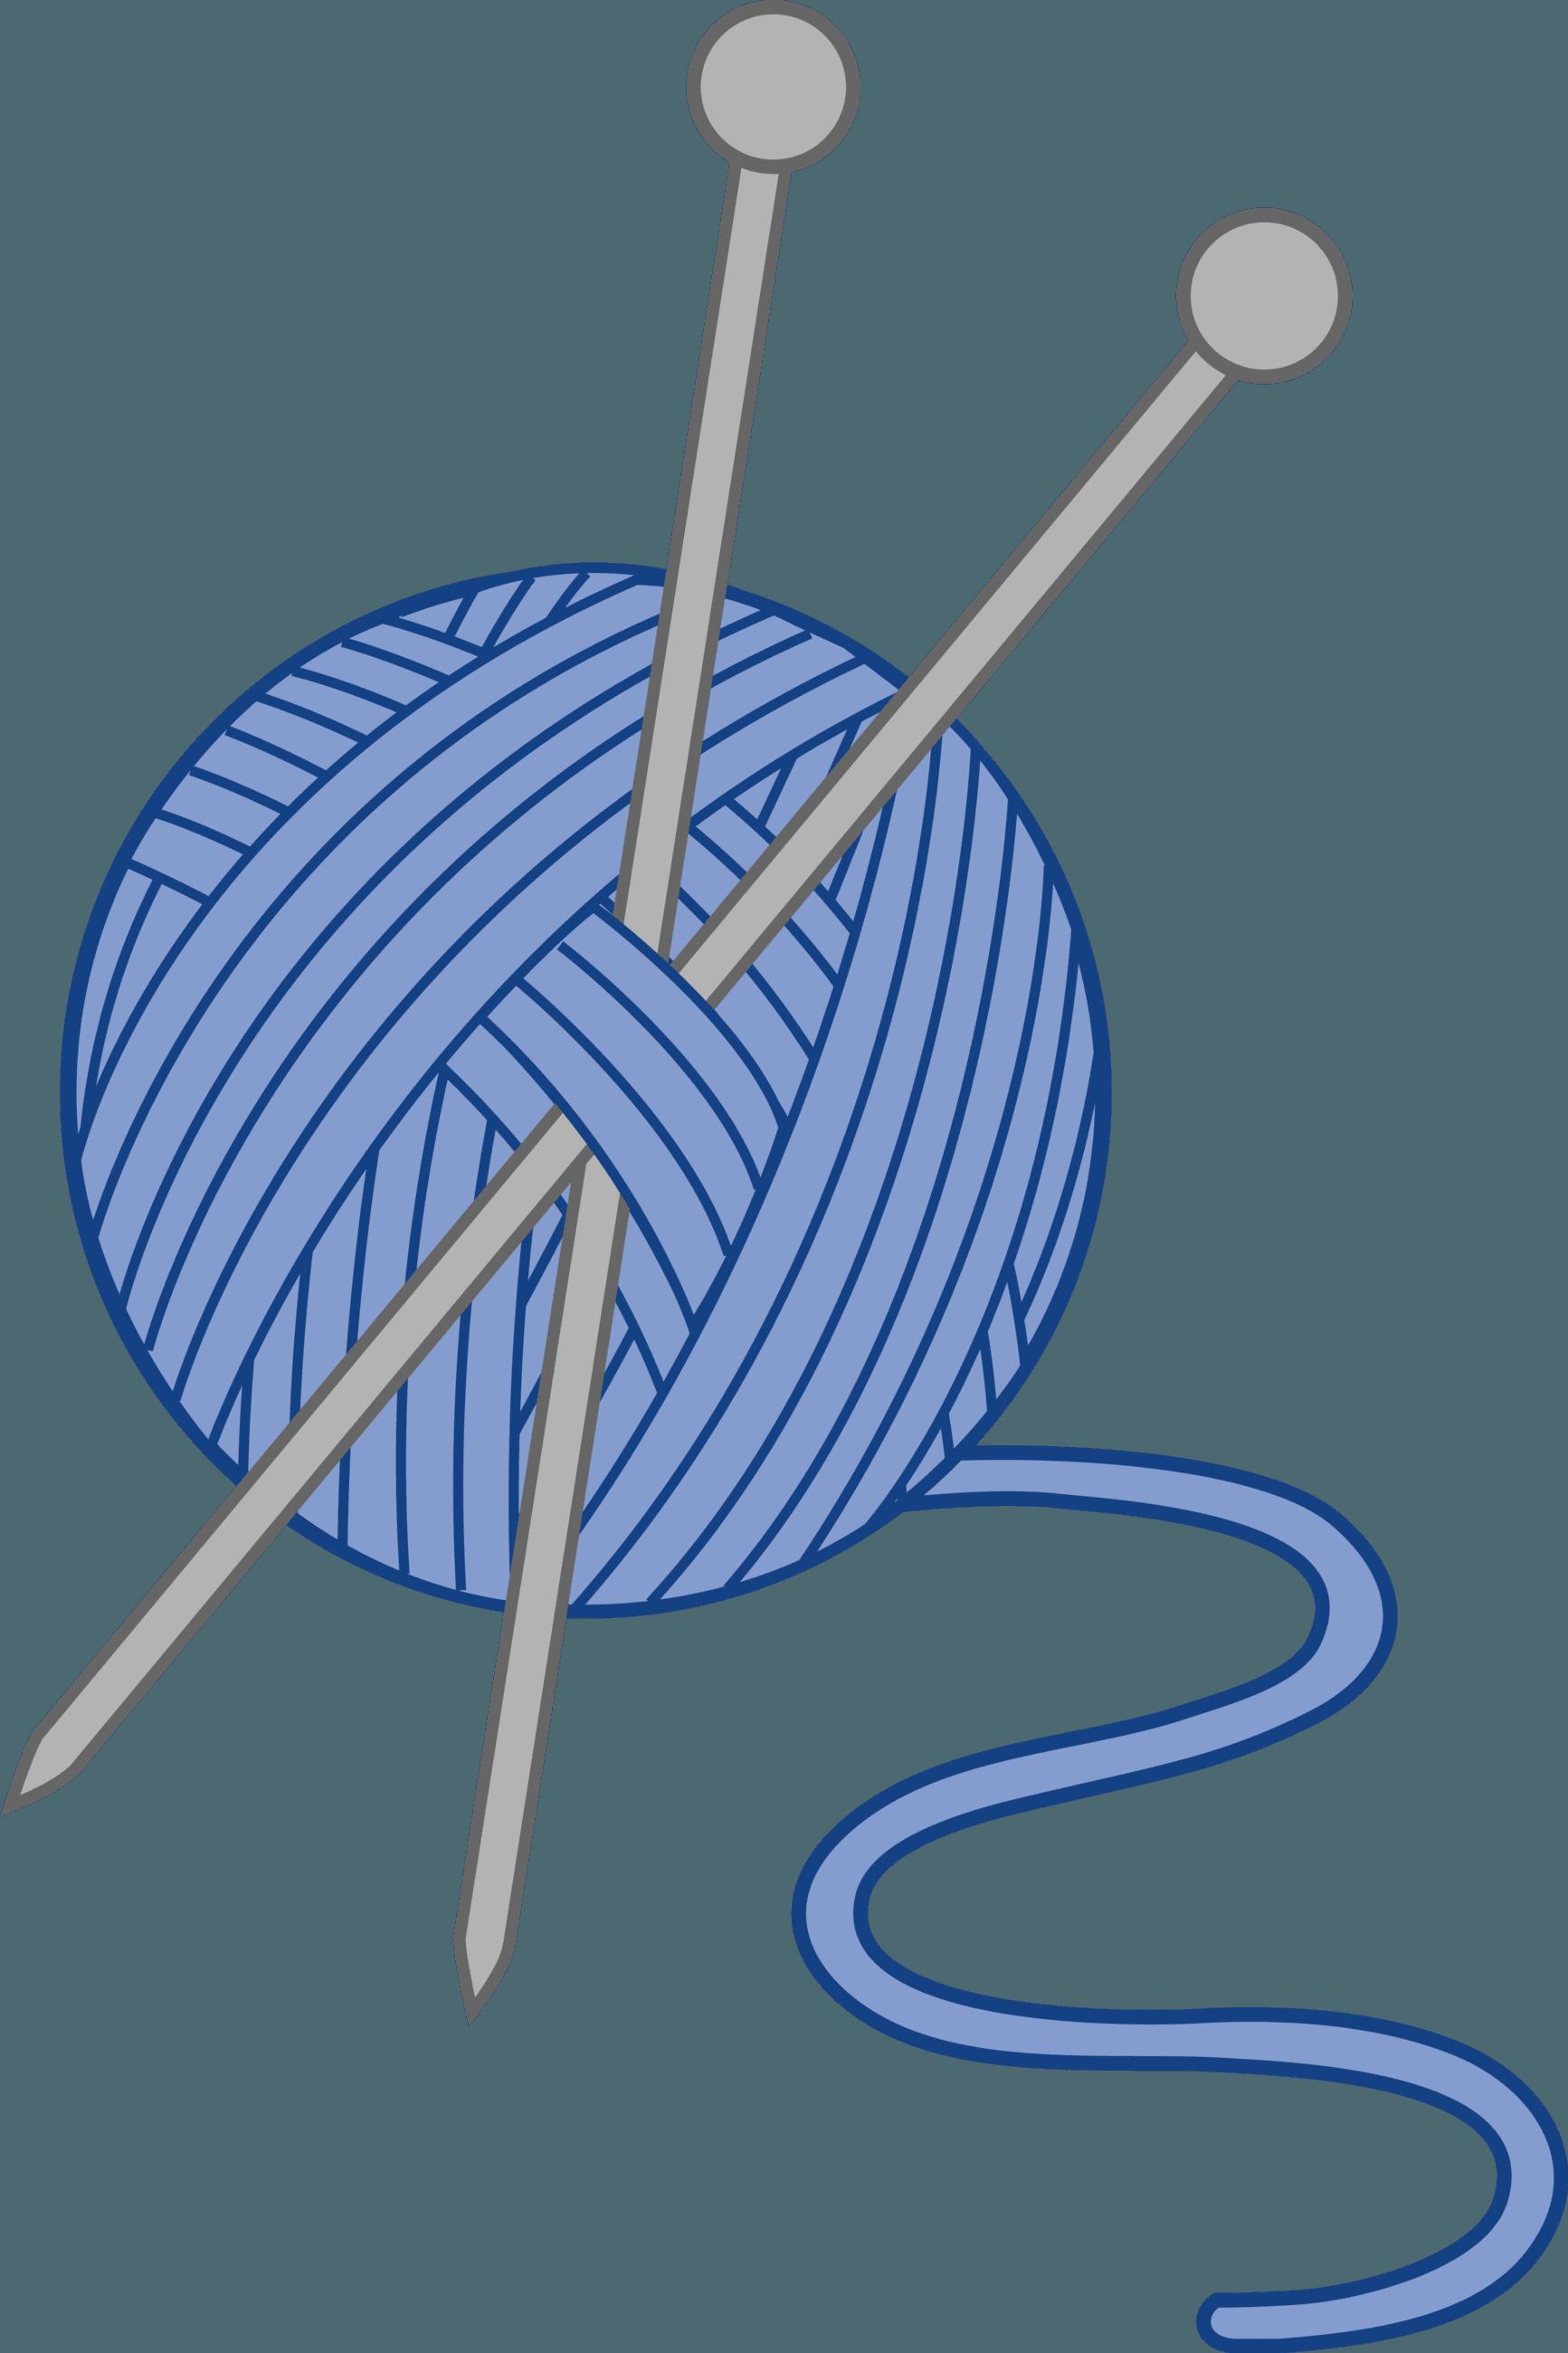 Laconia nh and knitting. Crochet clipart blue yarn